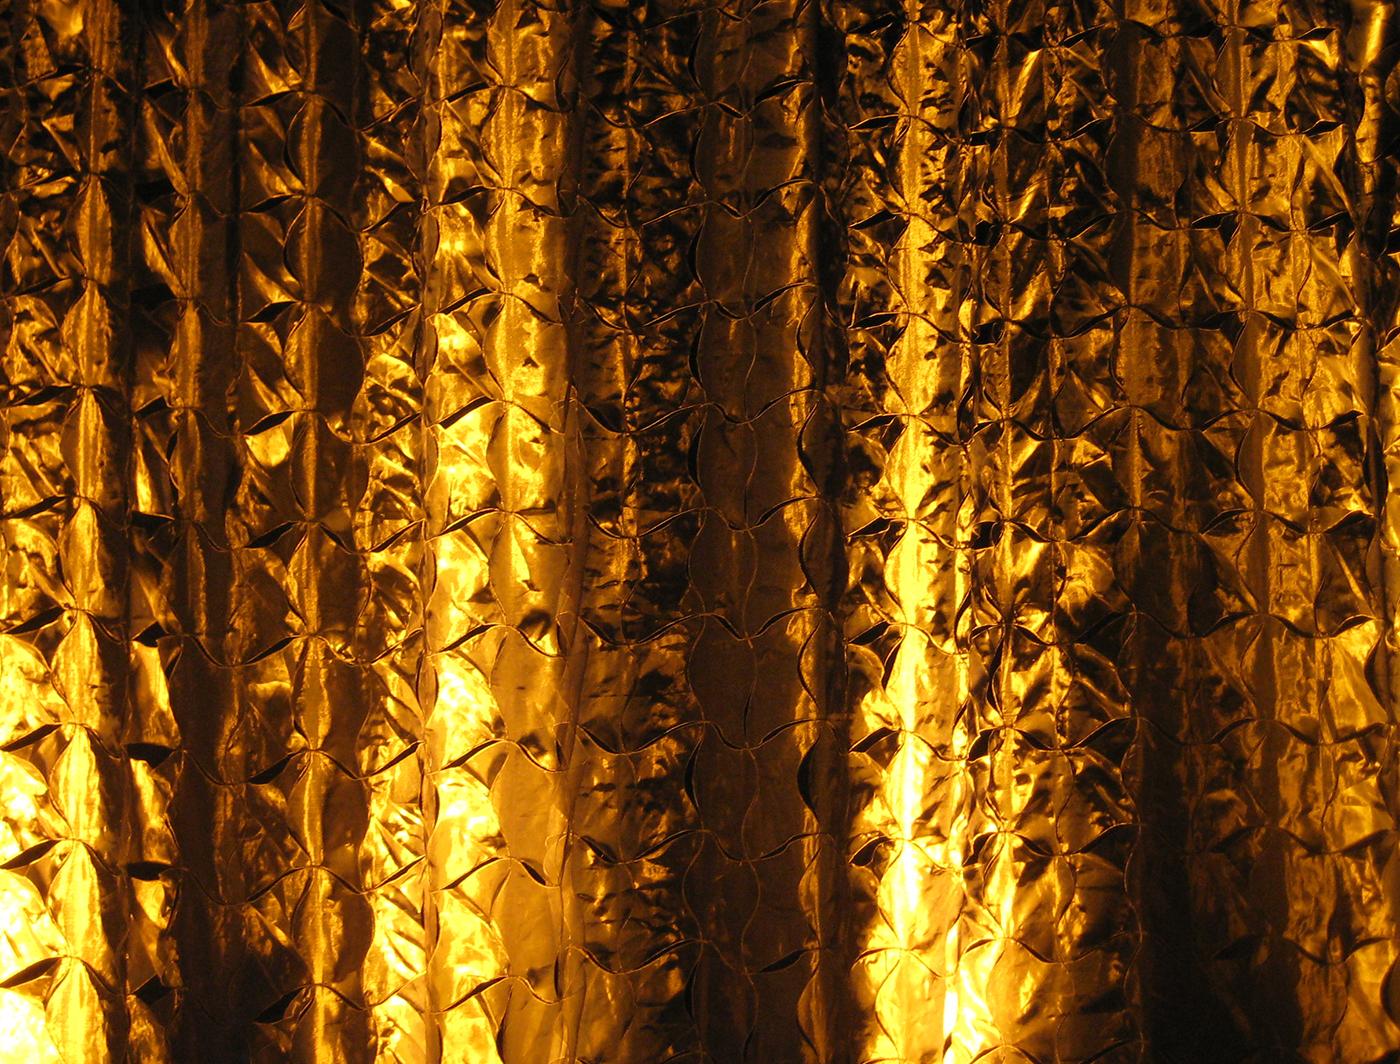 CONFETTI CLOTH BACKDROP LIGHTS BEAUTIFULLY